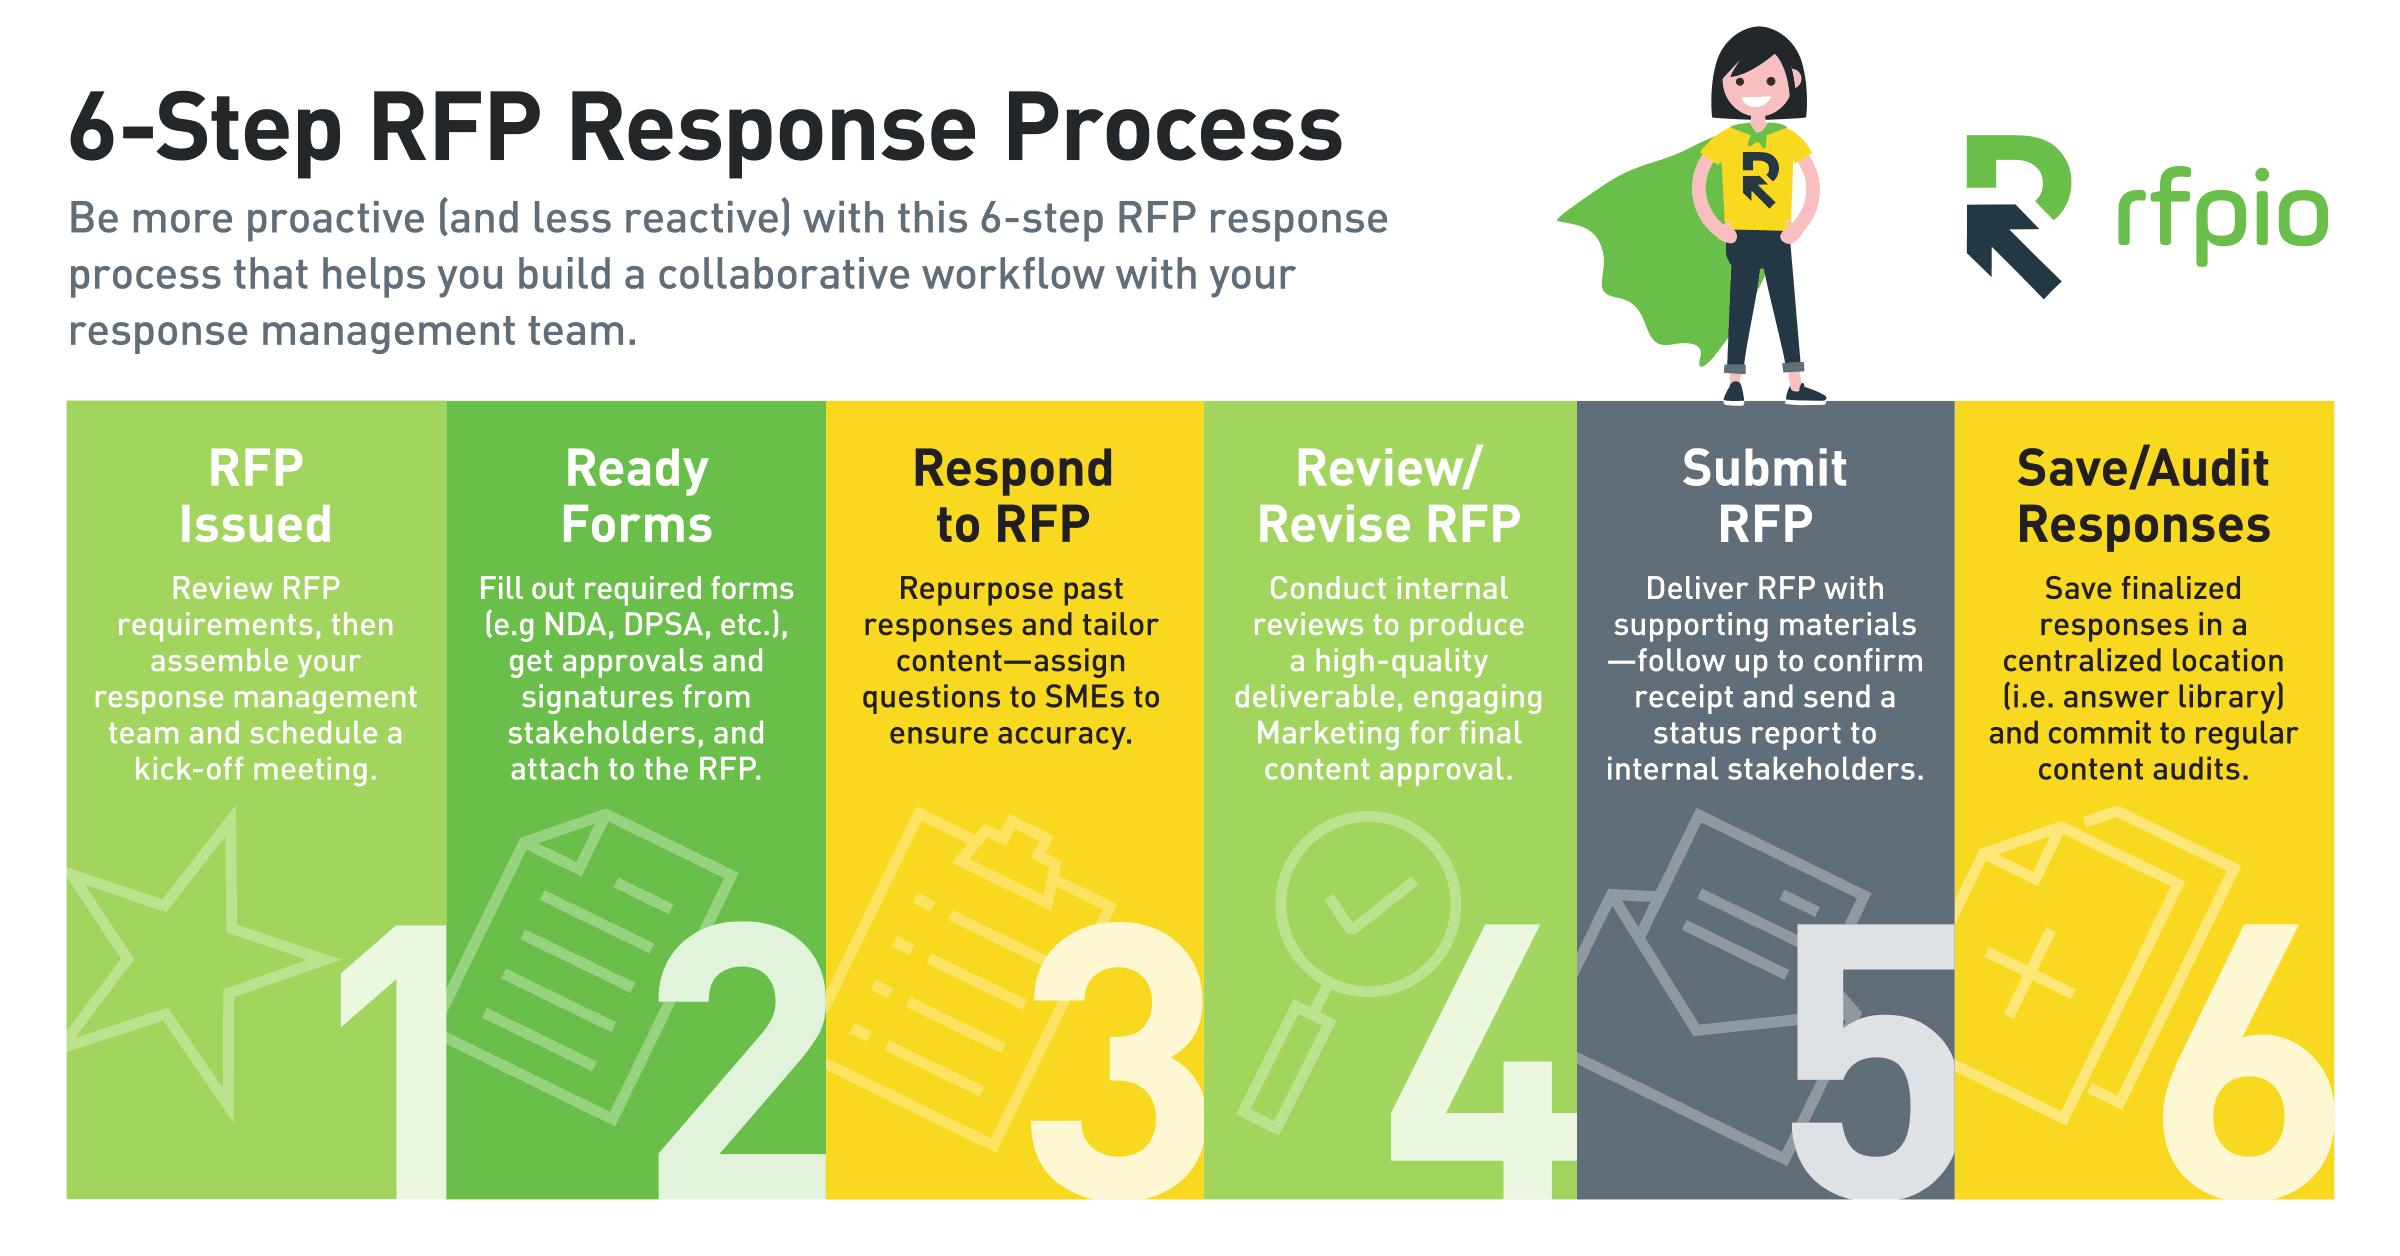 rfp response process